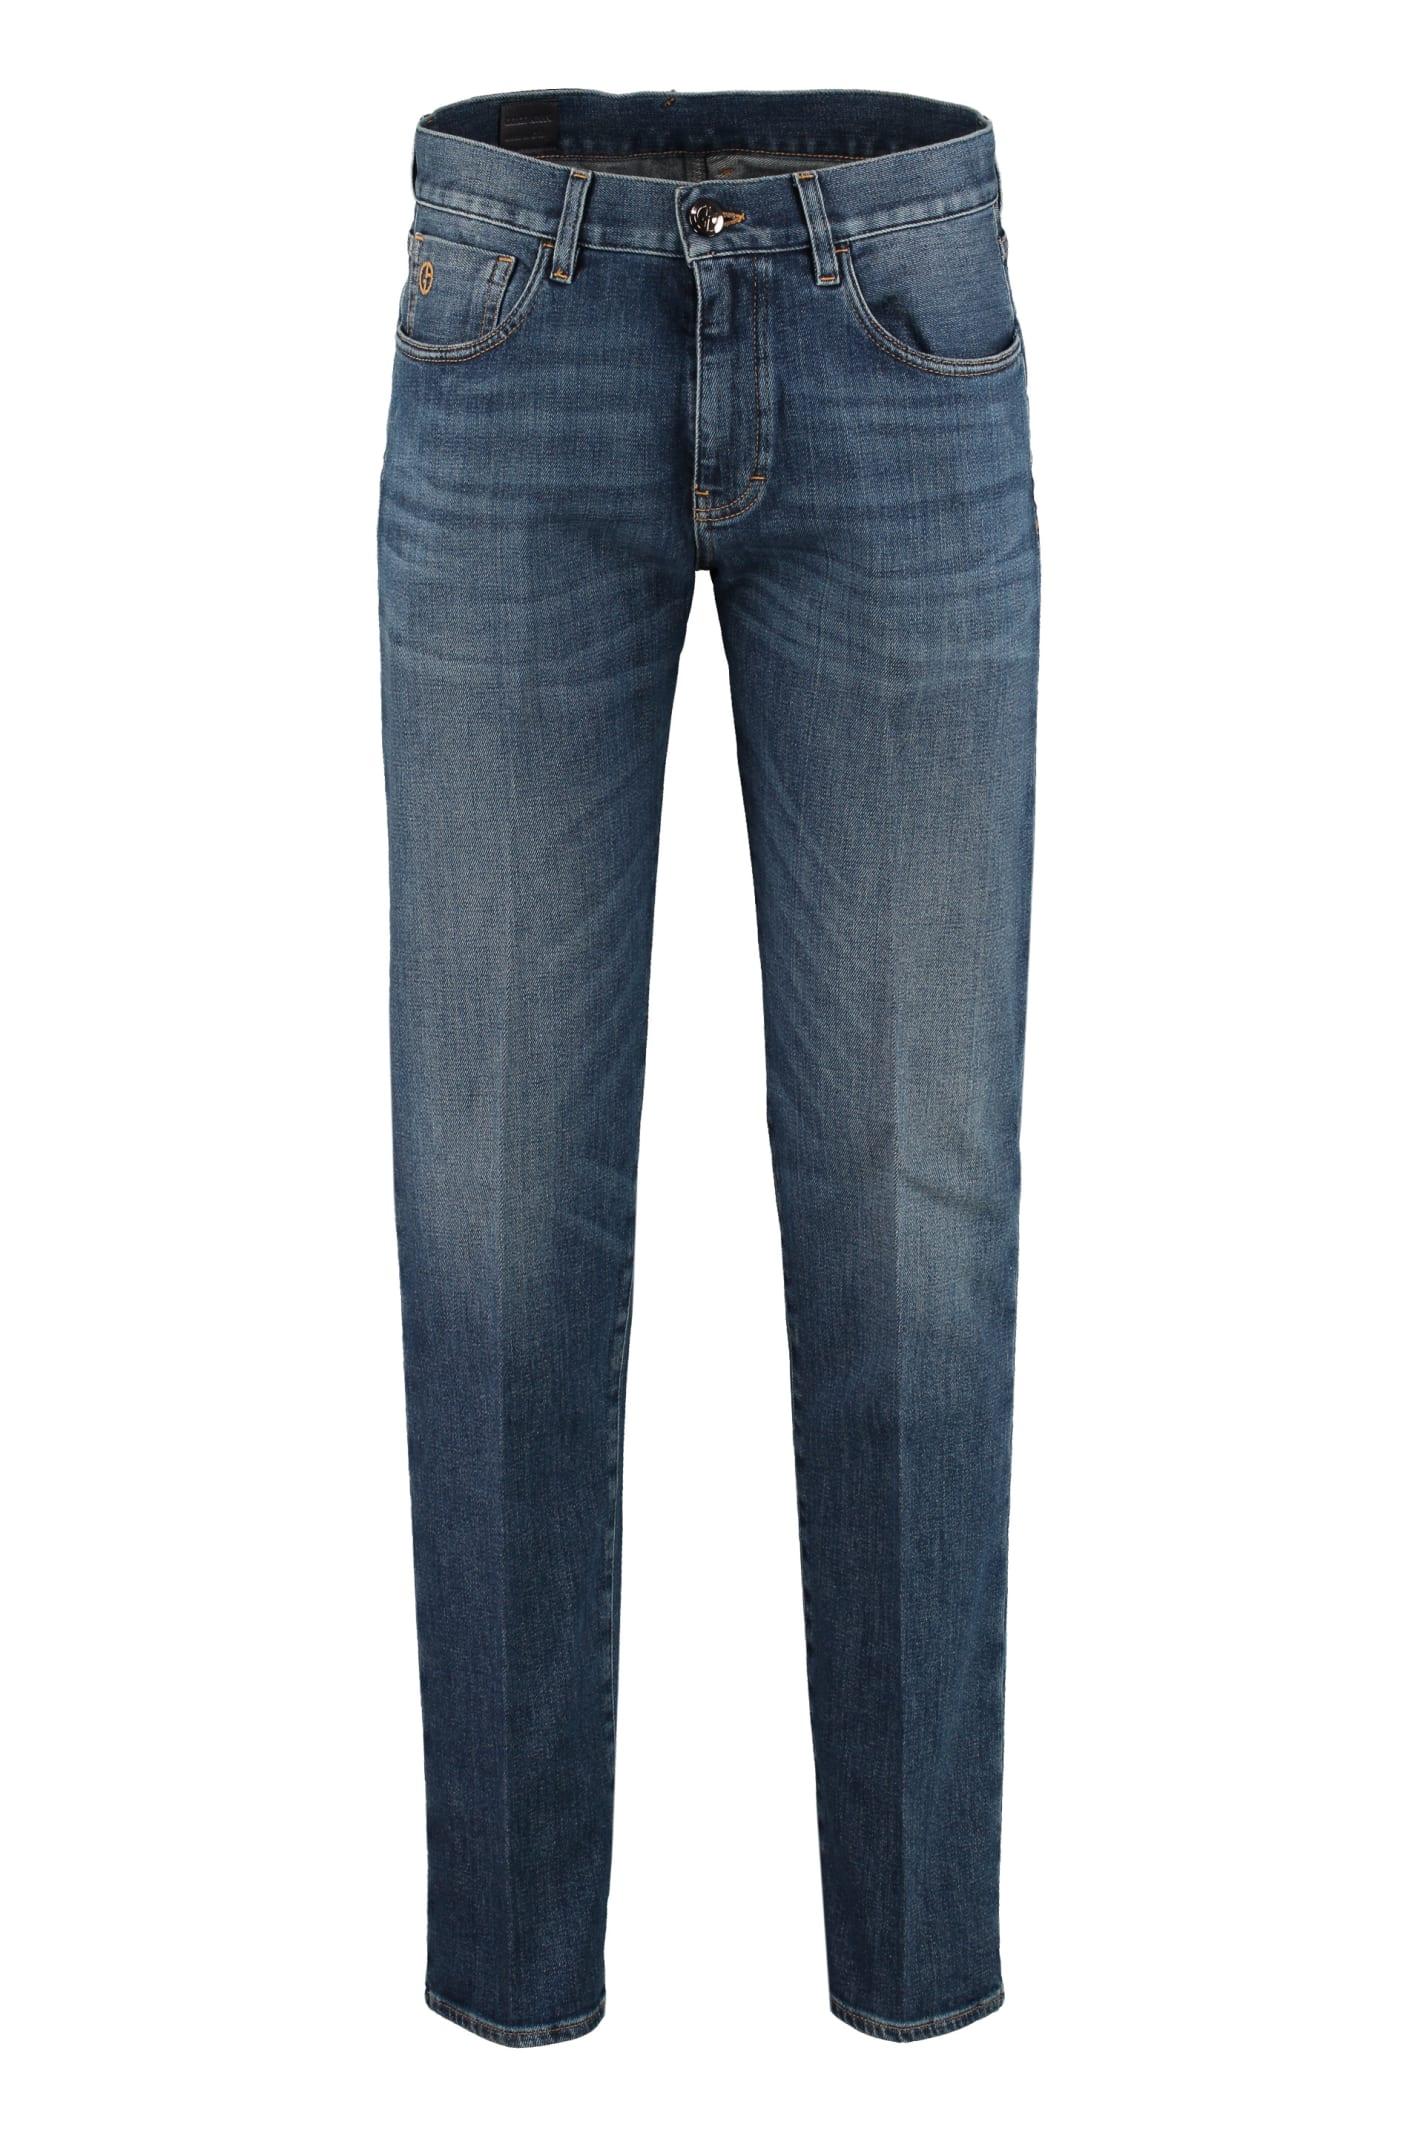 Giorgio Armani Slim Tapered Fit Jeans